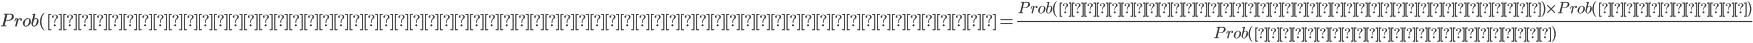 { Prob(デートの印象「良」が「好き」から生まれた) = \frac{Prob(「好き」の時に「良」を引く) \times Prob(「好き」)}{Prob(「良」を引く確率)} }